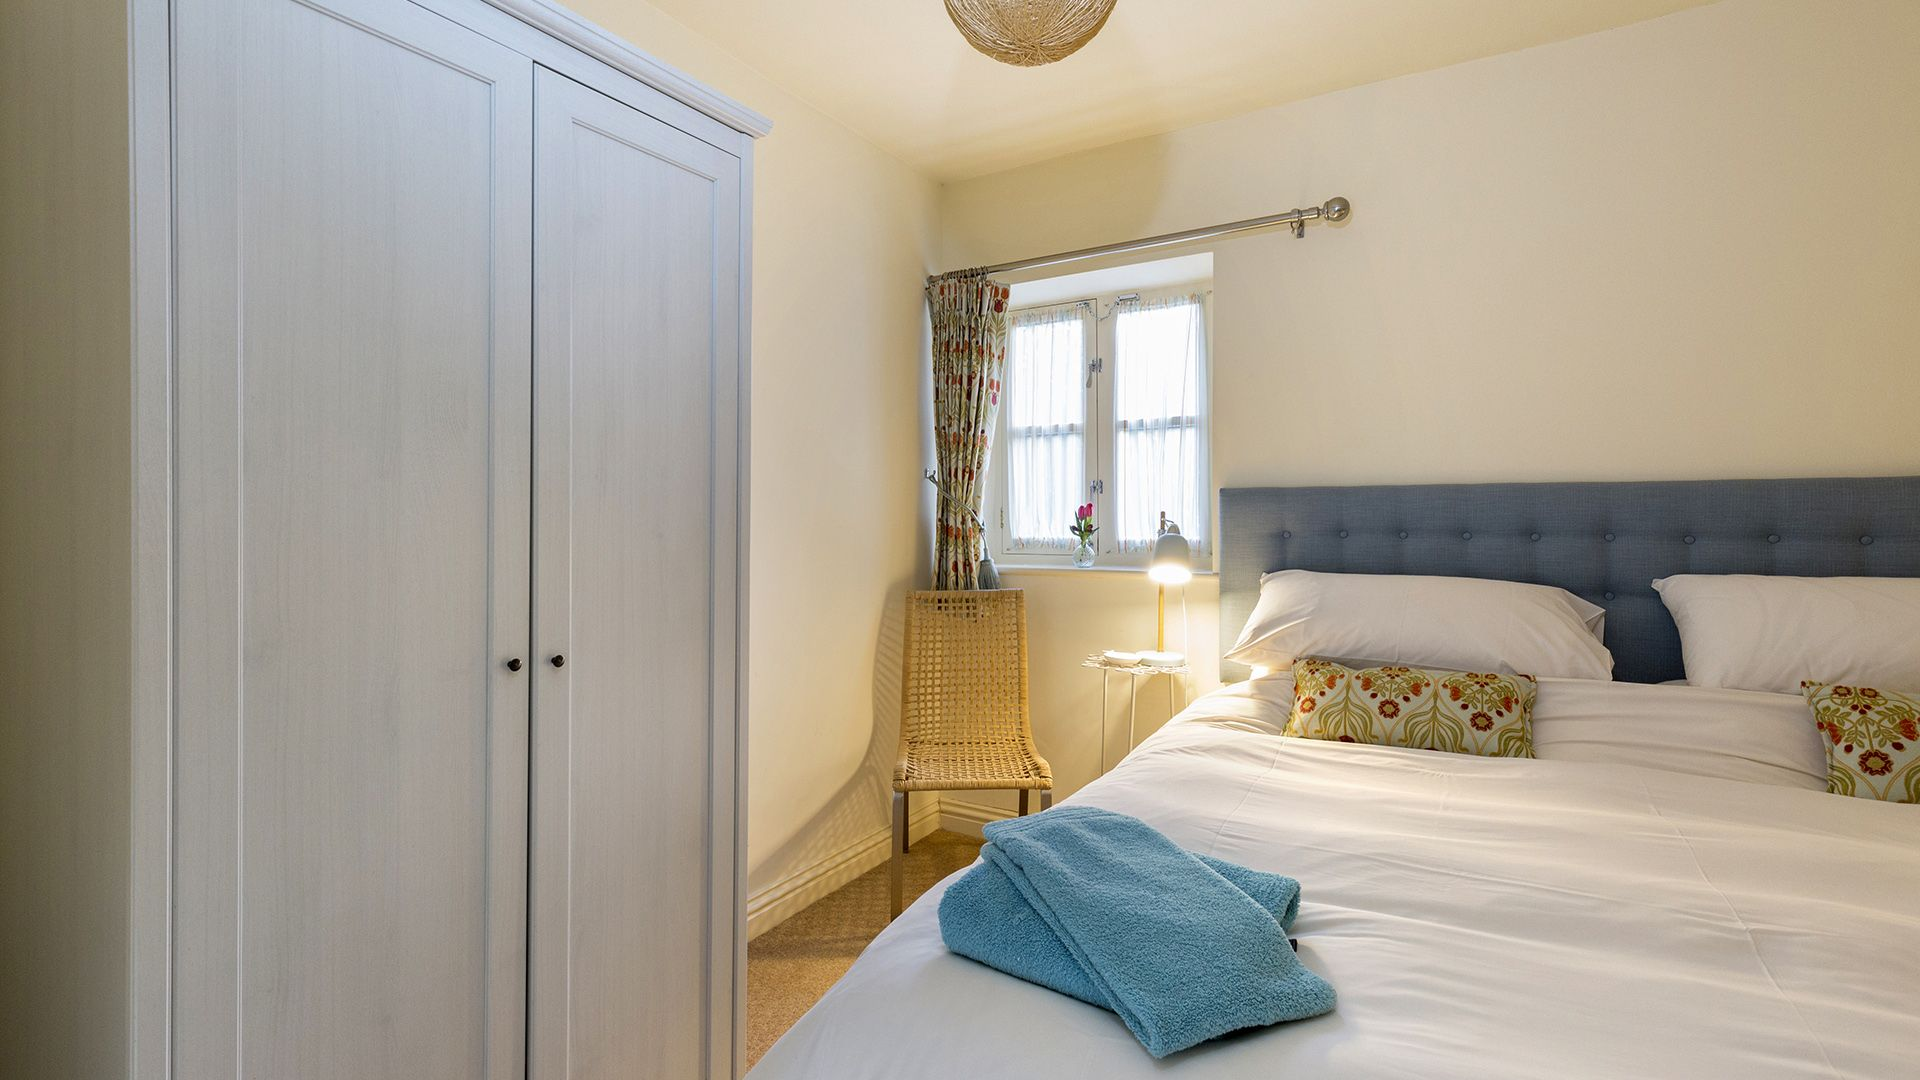 Bedroom 1, en-suite shower, The Leat at Wynard Mill, Bolthole Retreats